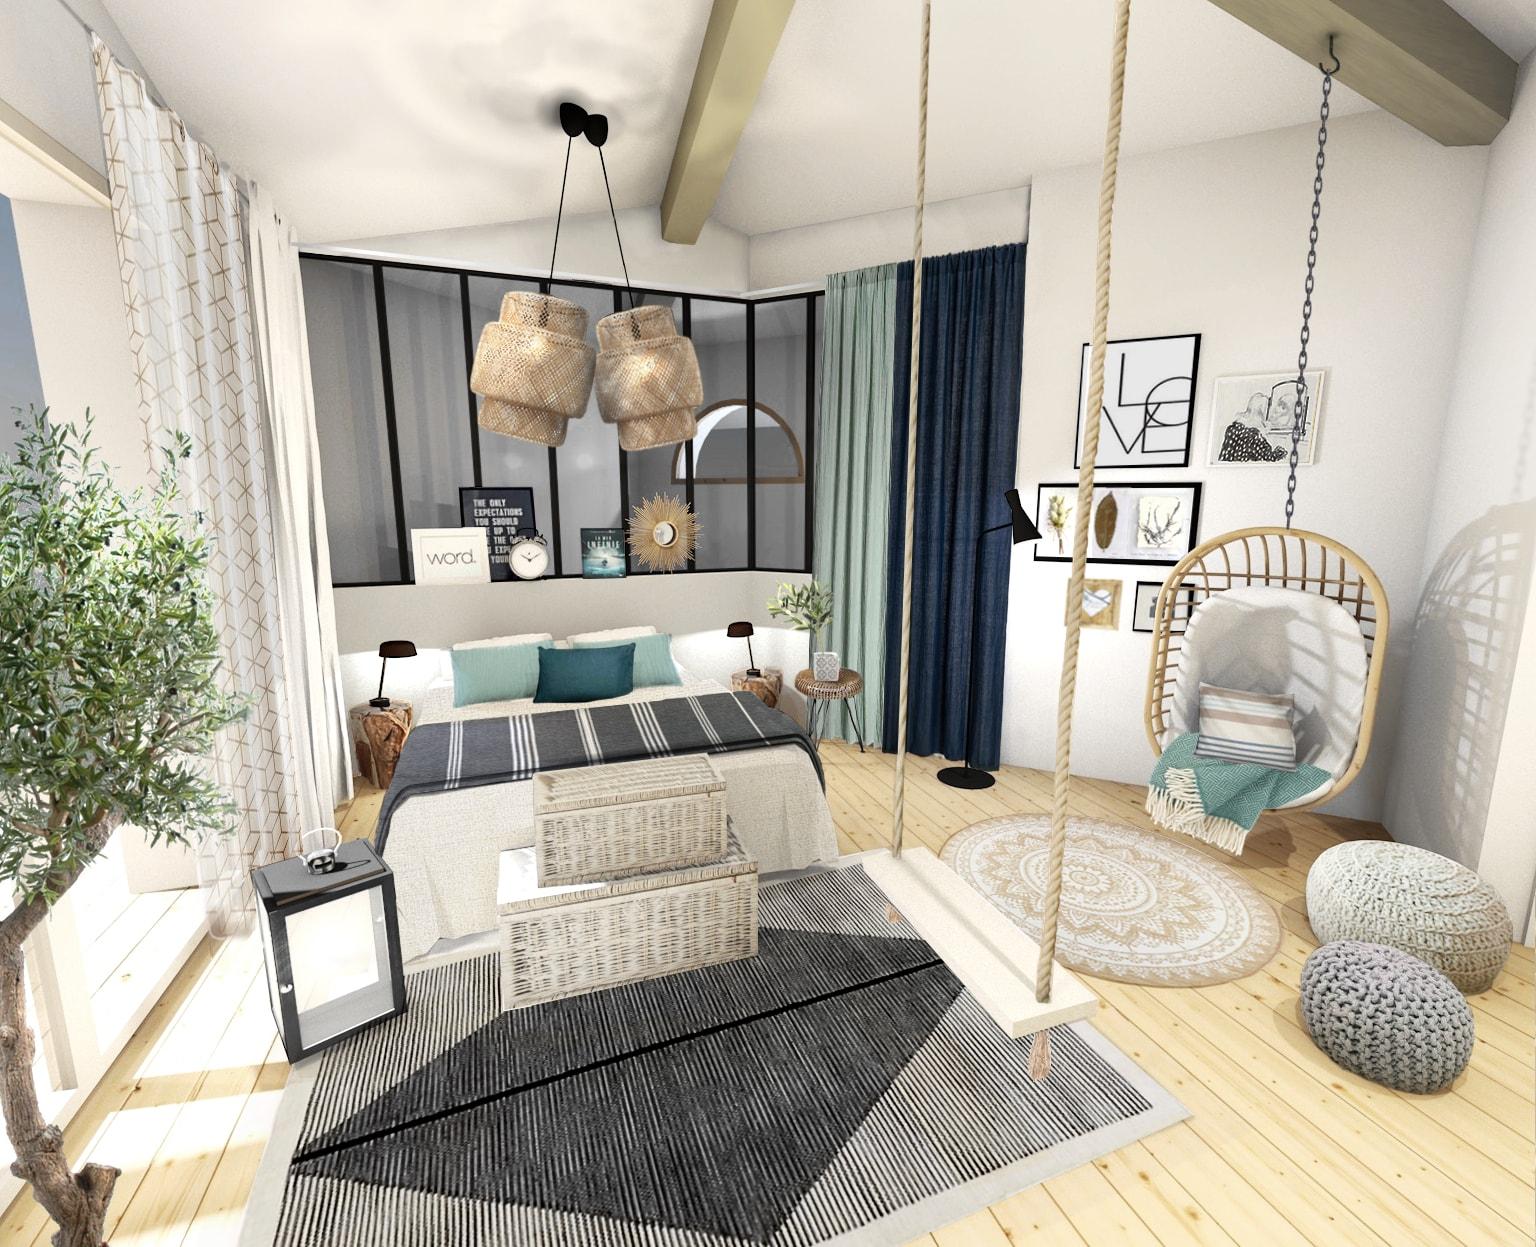 une belle chambre l 39 esprit bord de mer chic. Black Bedroom Furniture Sets. Home Design Ideas